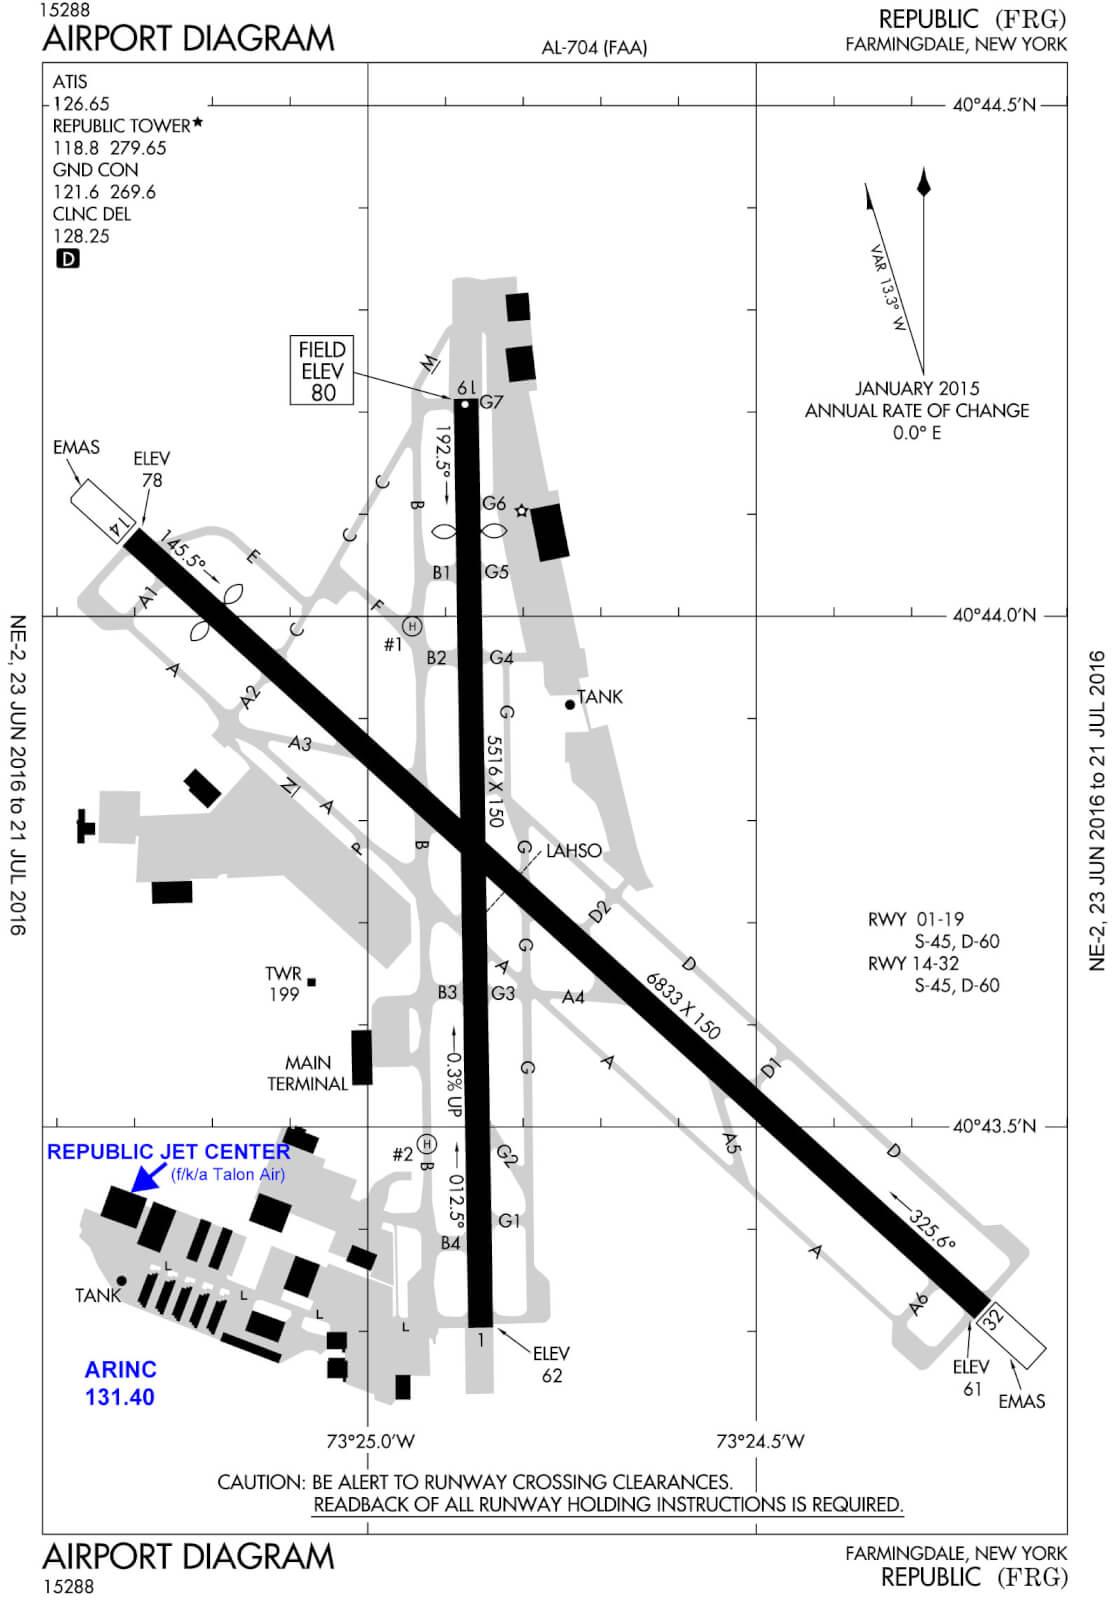 Farmingdale FBO - Republic Jet Center